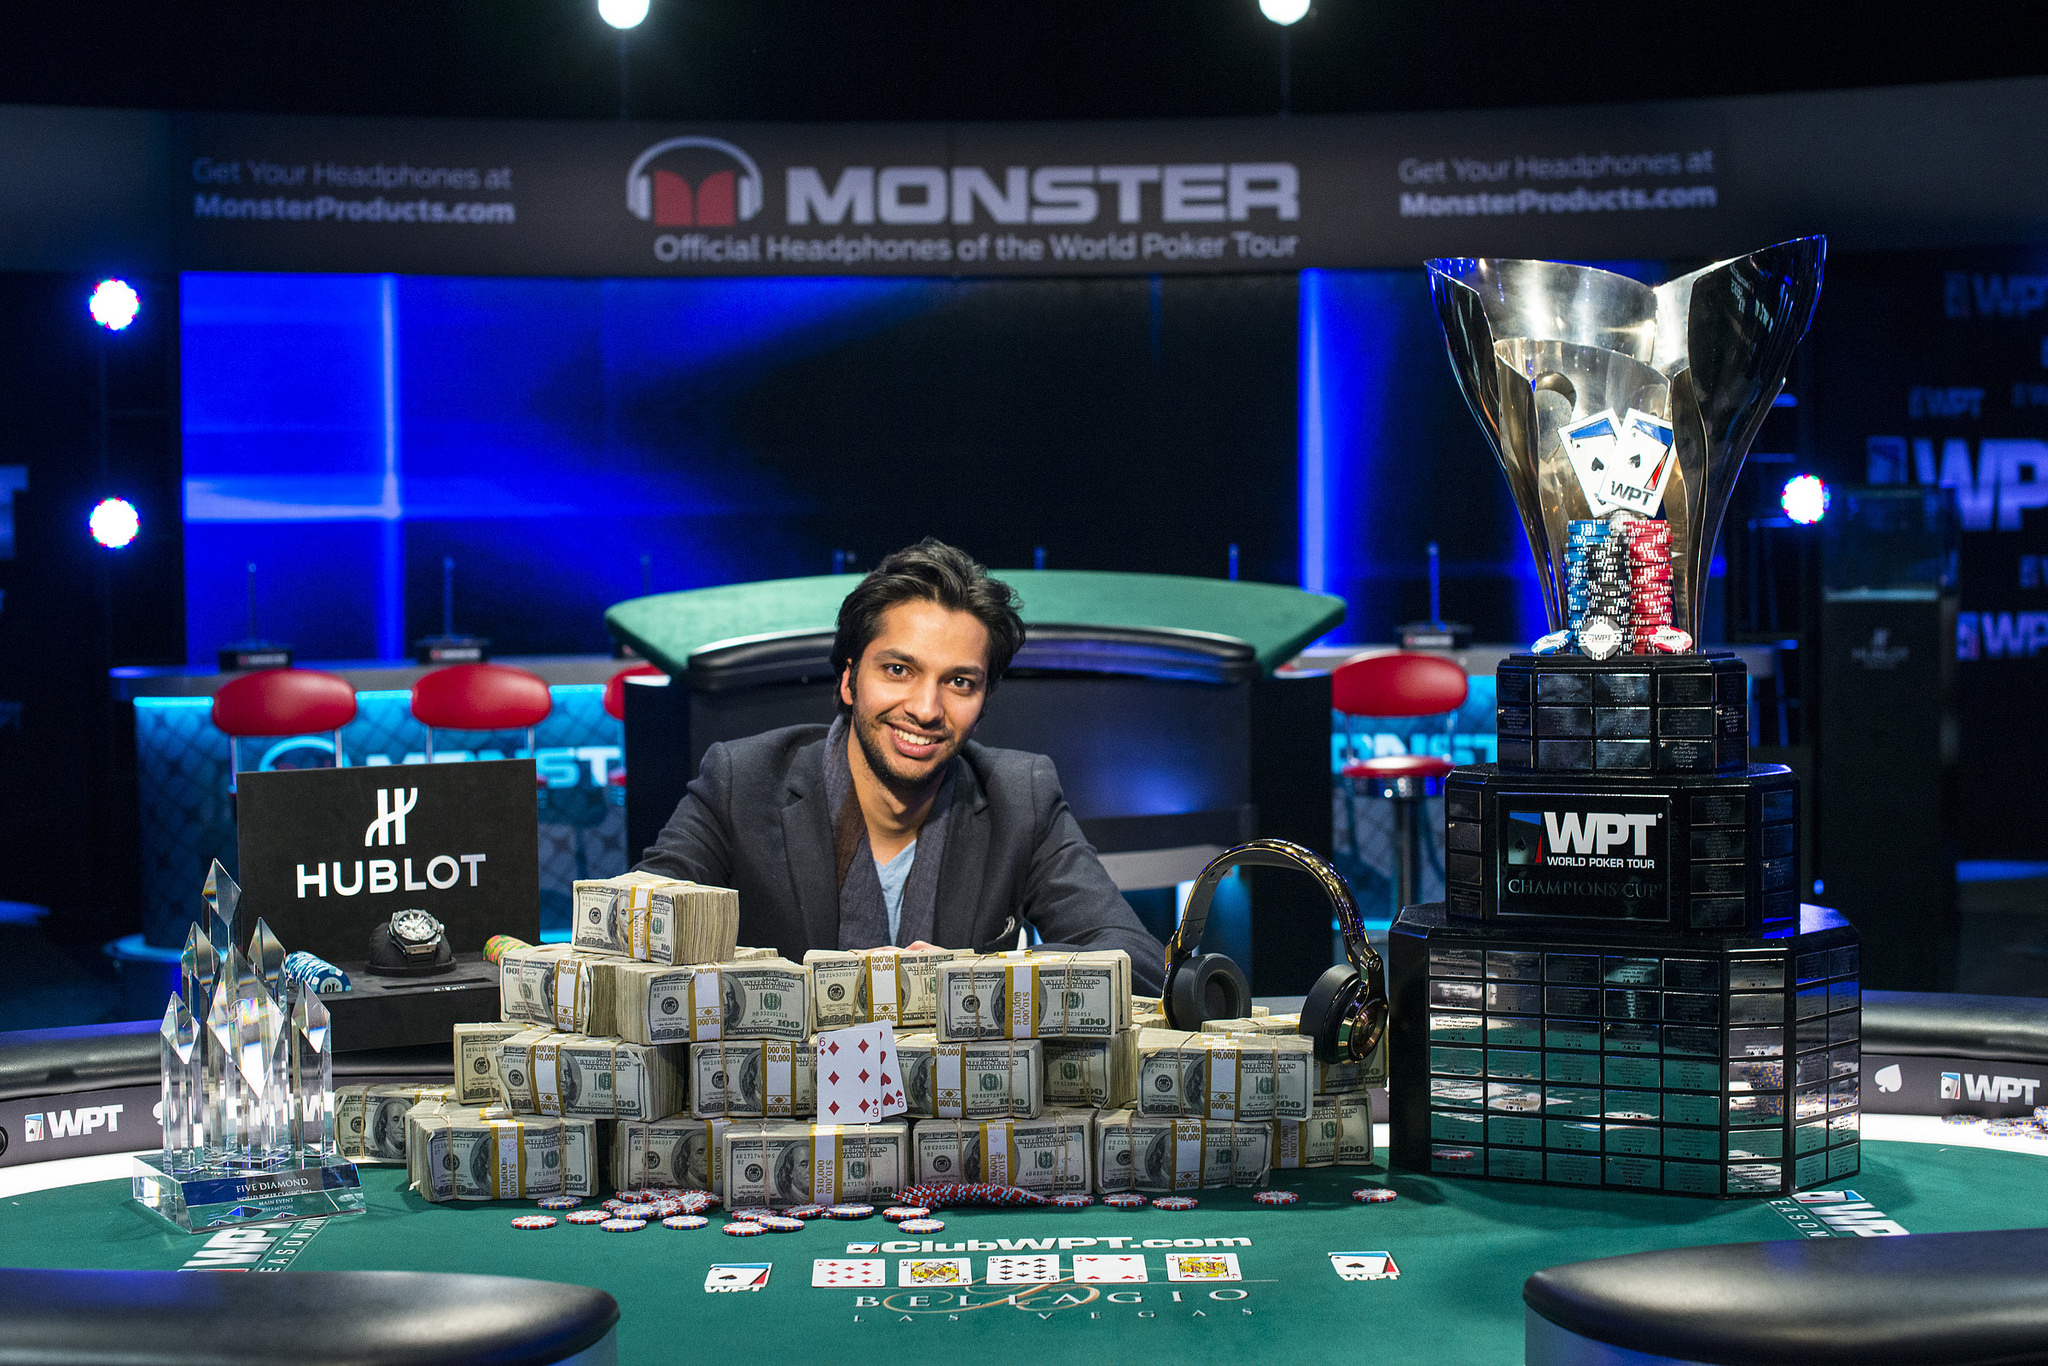 Vegas world poker tour giochi di poker texano gratis